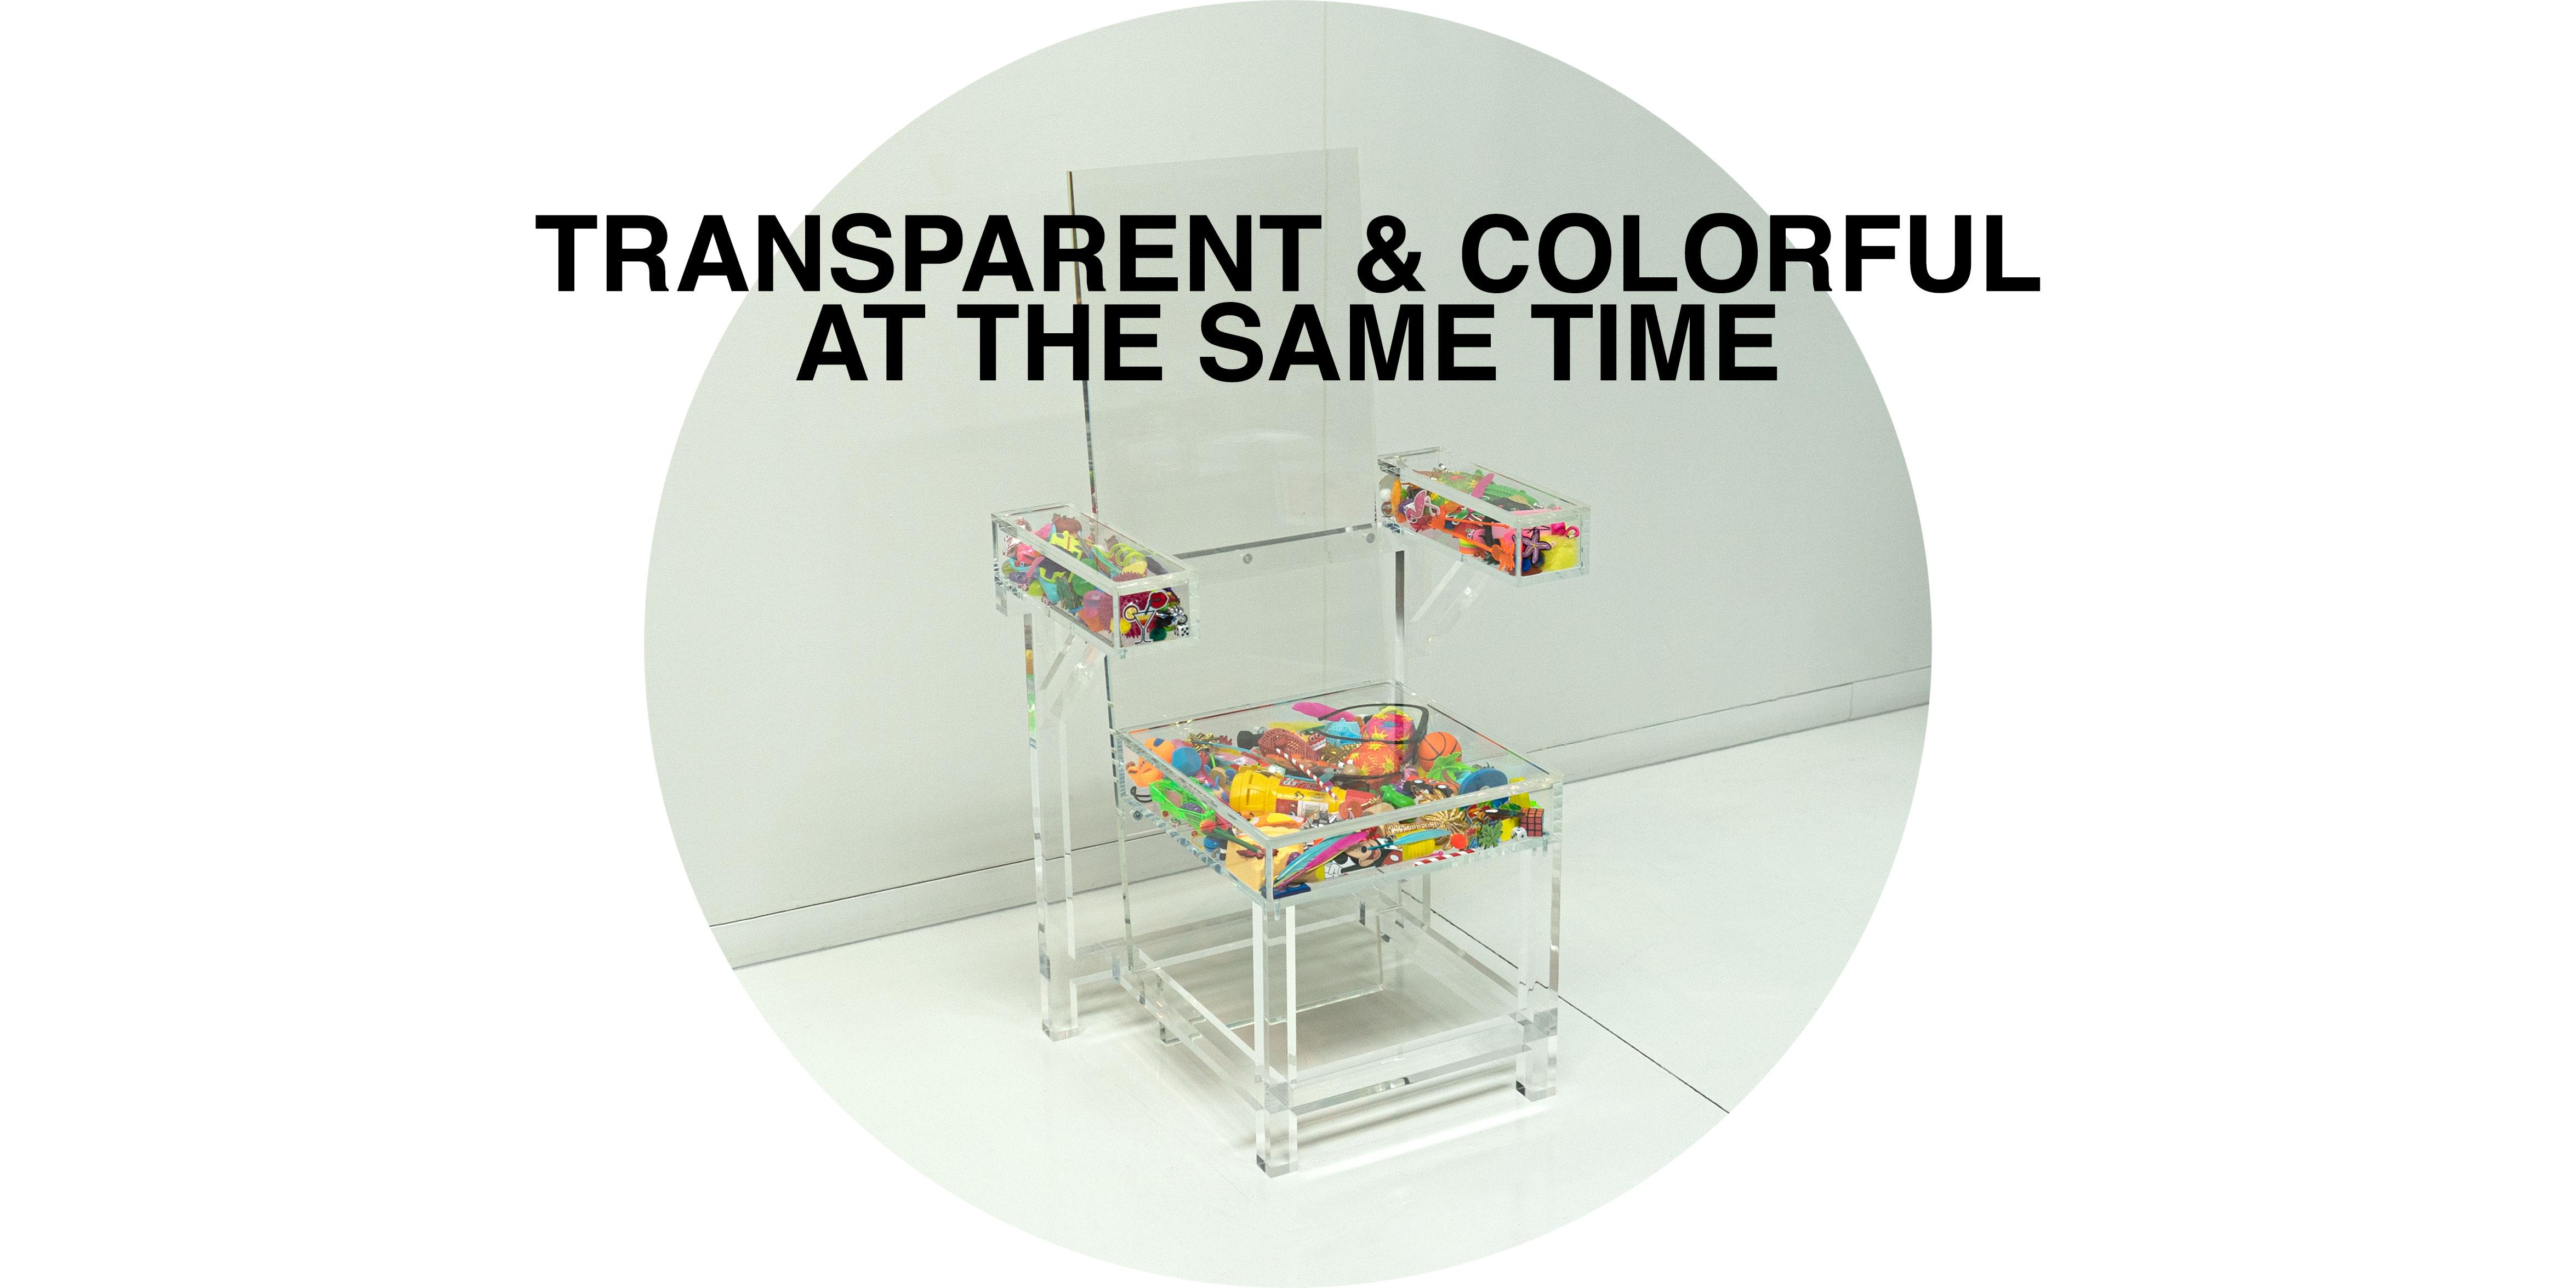 03-TransparentColorful-08